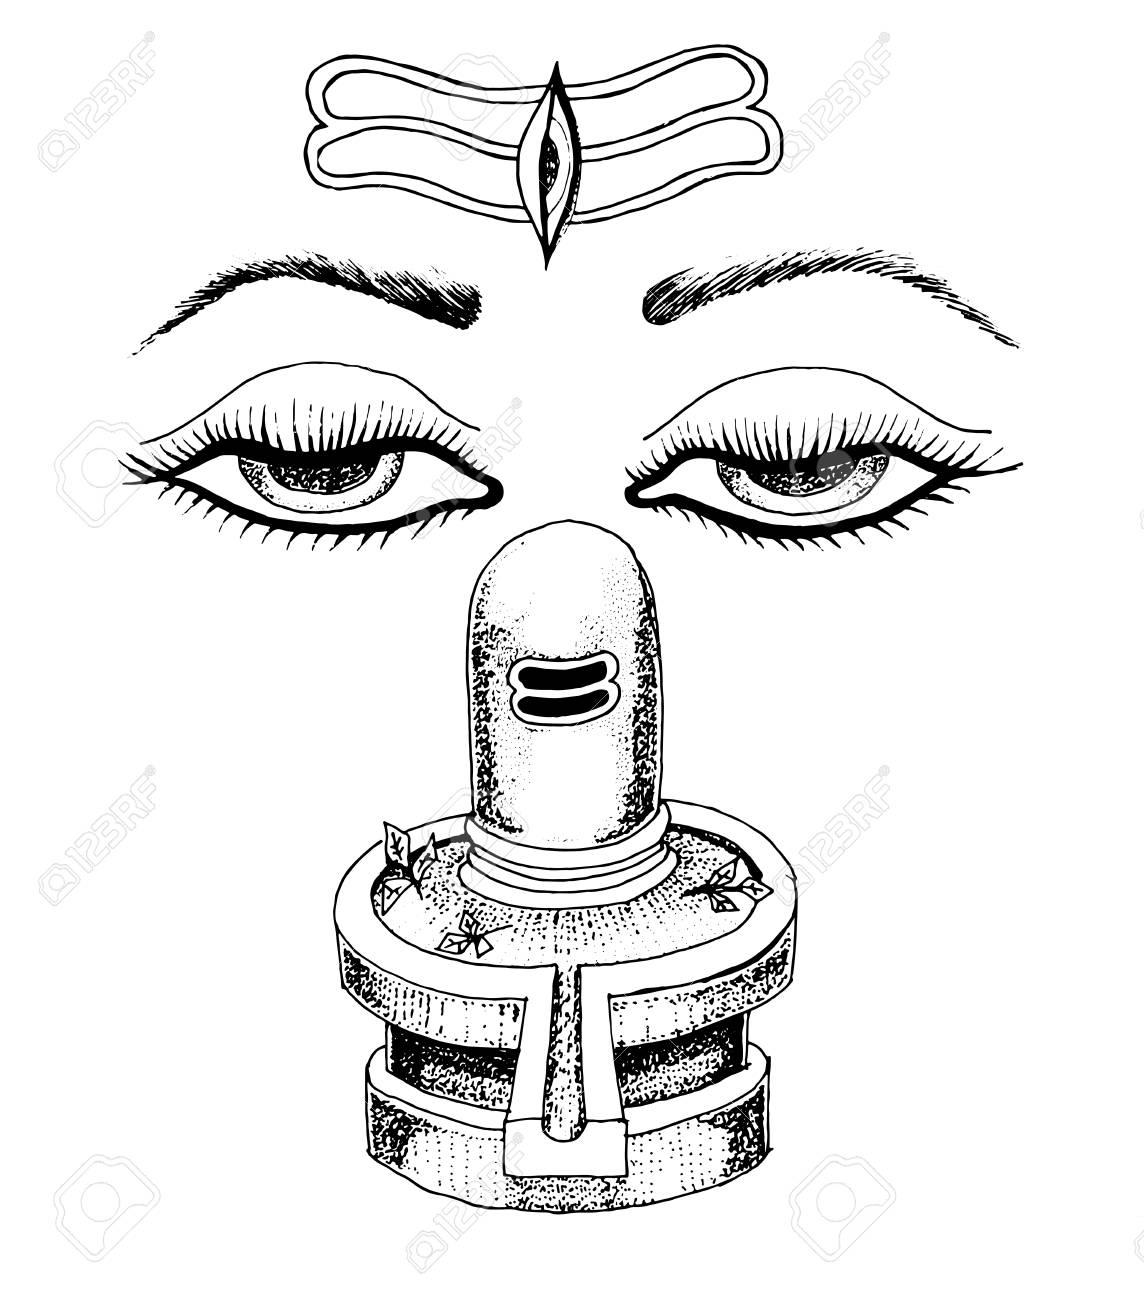 Lord Shiva Mahashivratri Outline Poster With Shiva Lingam Dharma